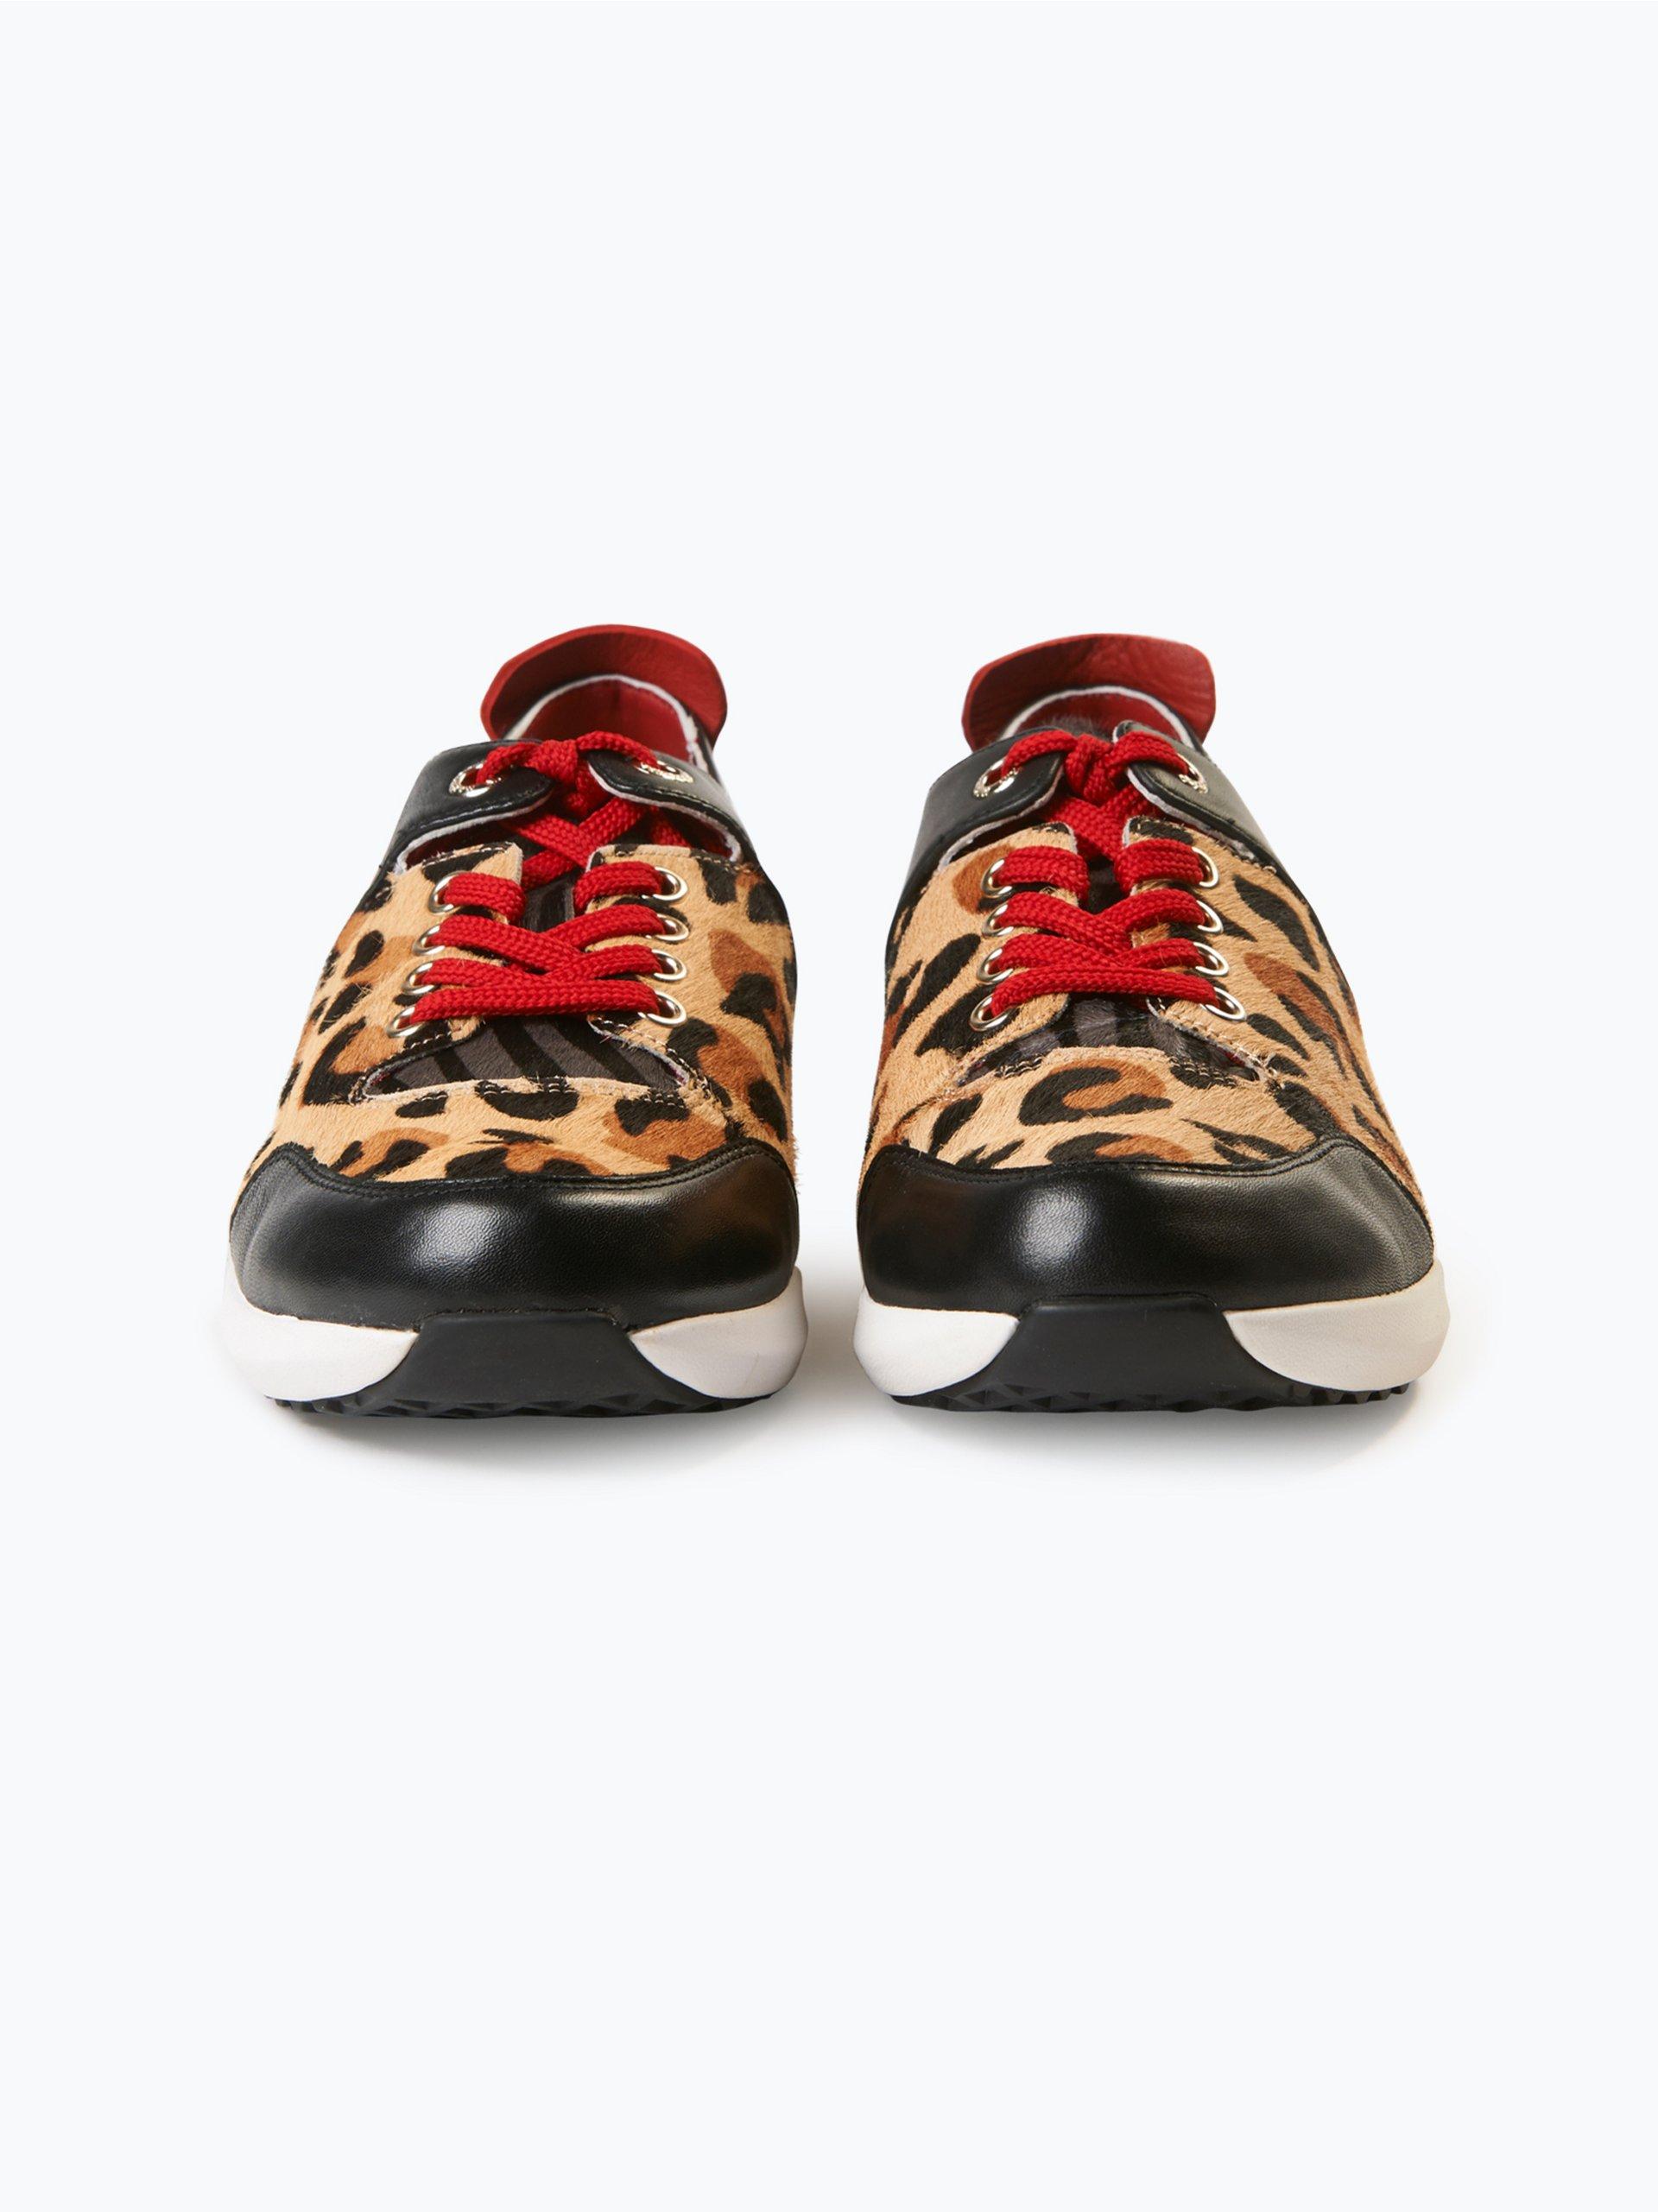 Marc Cain Bags & Shoes Damen Sneaker aus Kalbfell und Leder